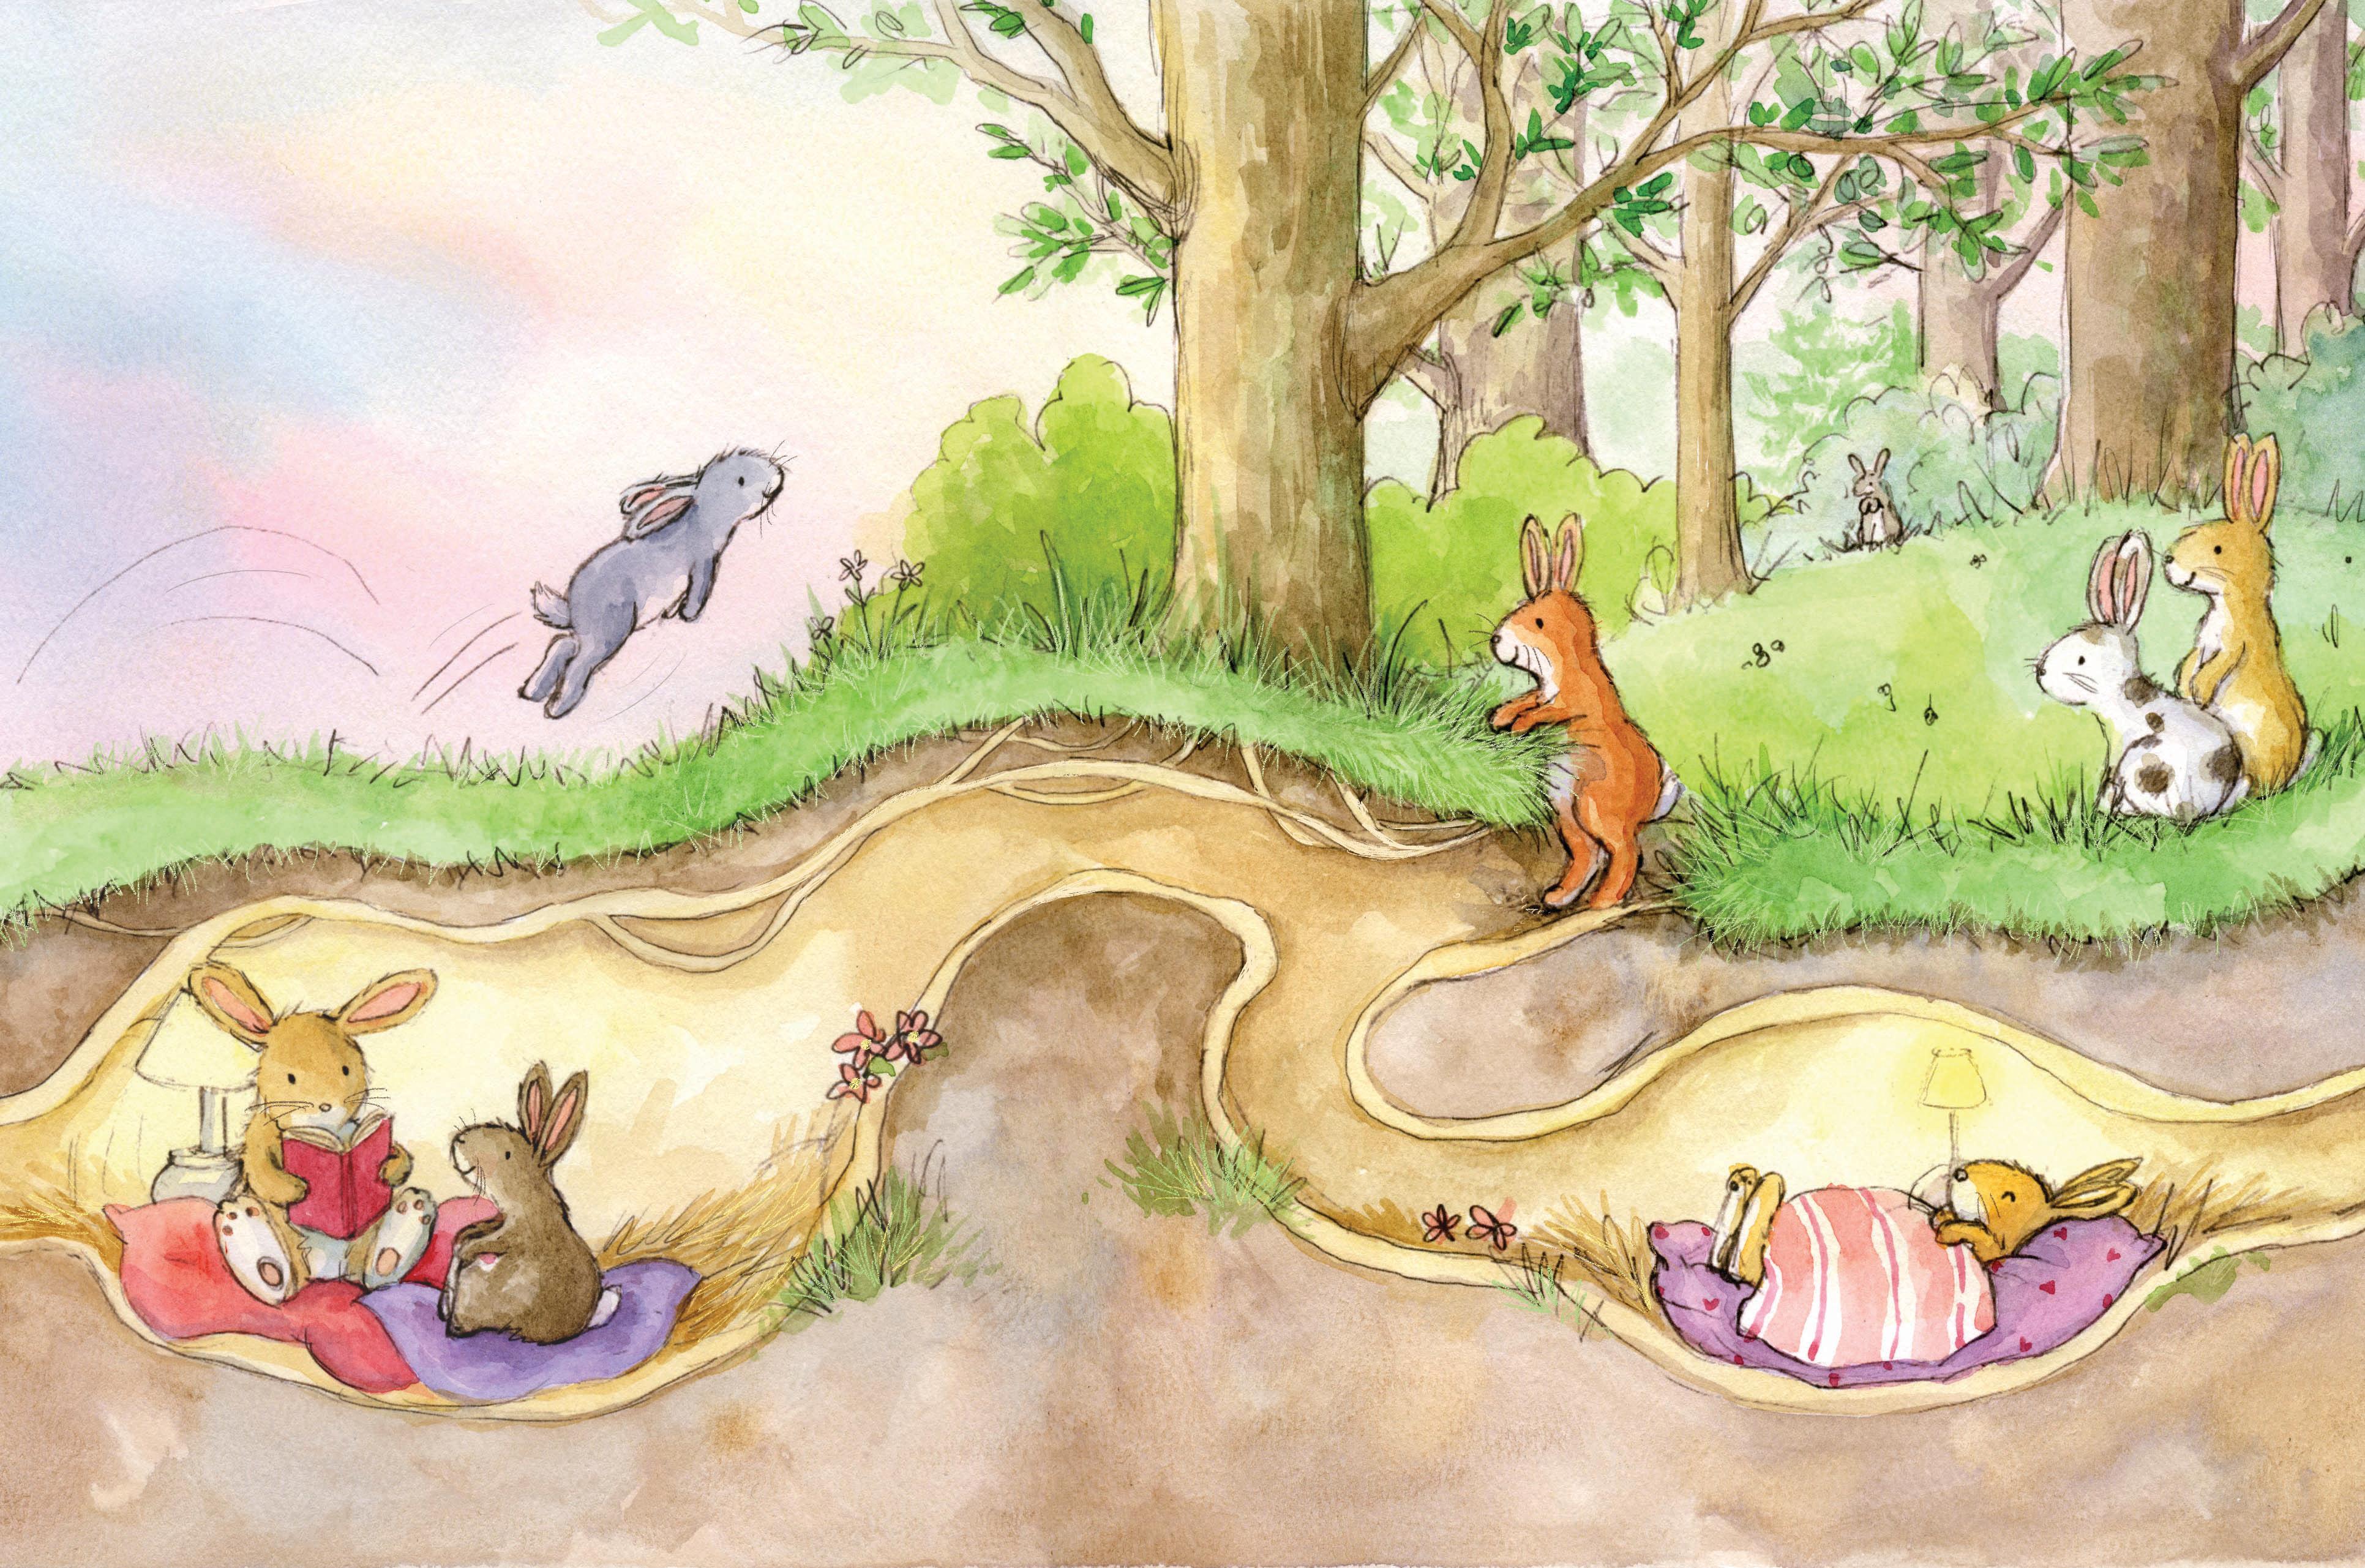 Rabbits playing at sunset_gail yerrill_portfolio